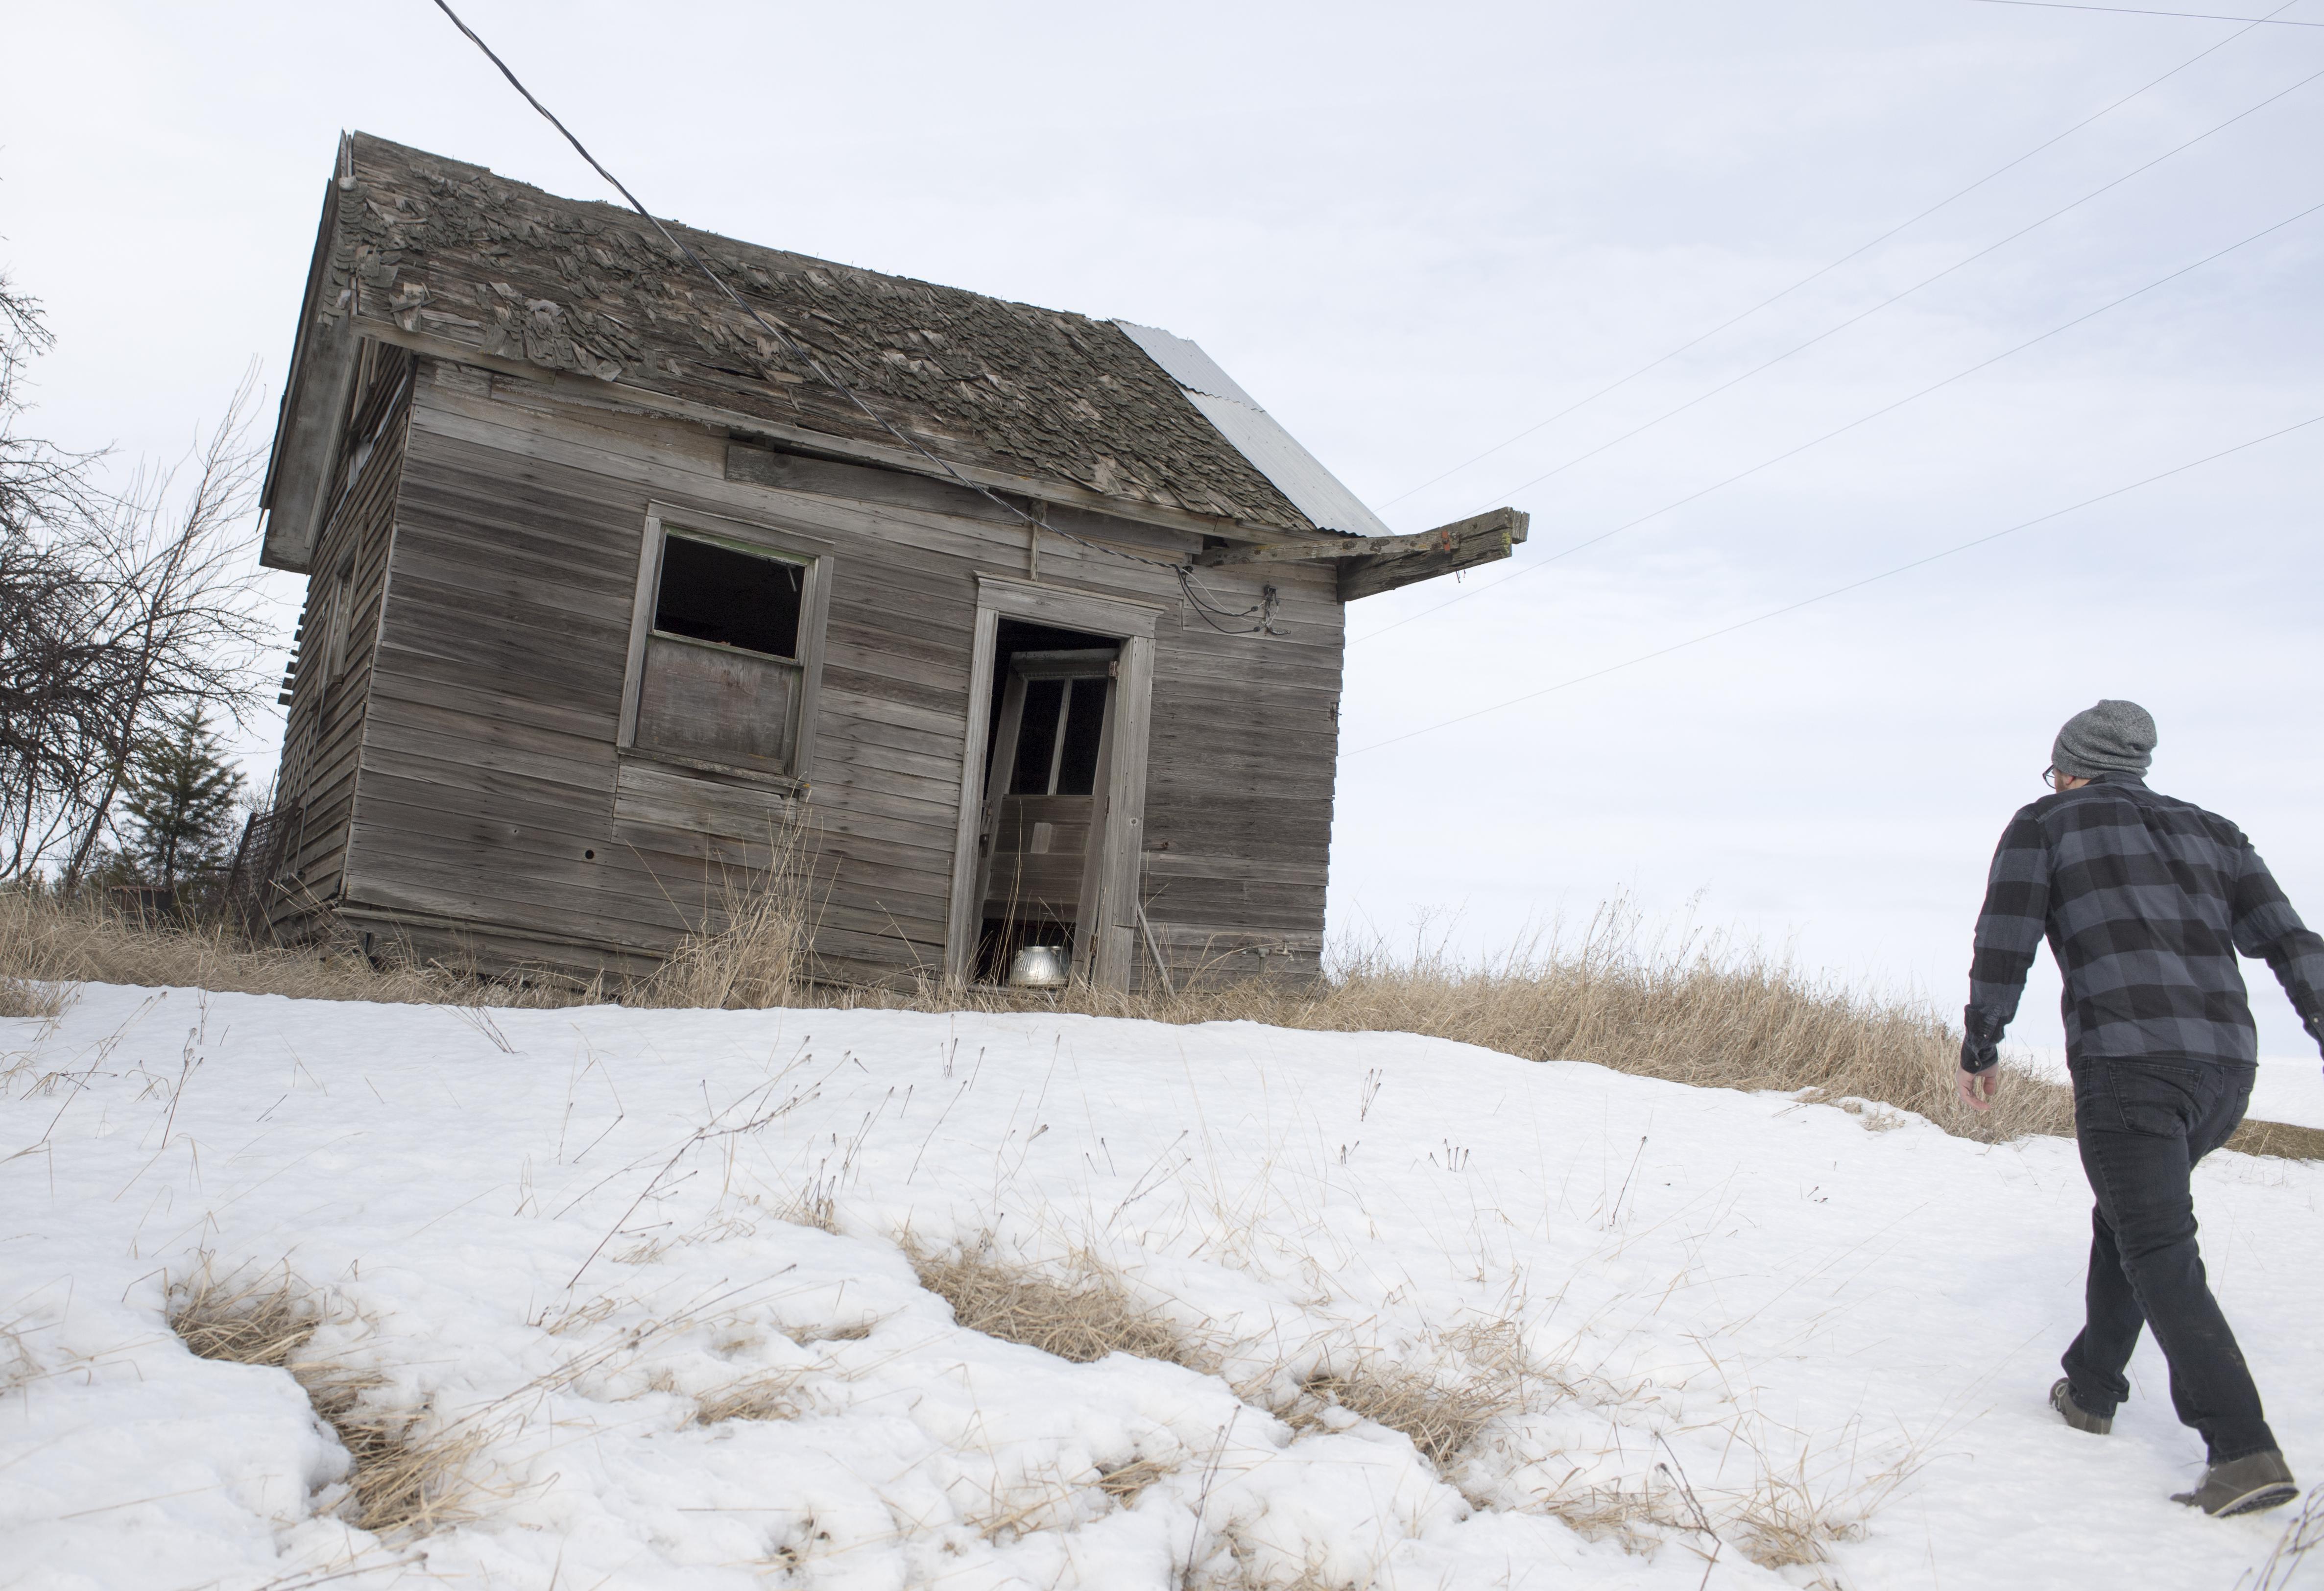 Sue Lani Madsen: Just because it looks abandoned